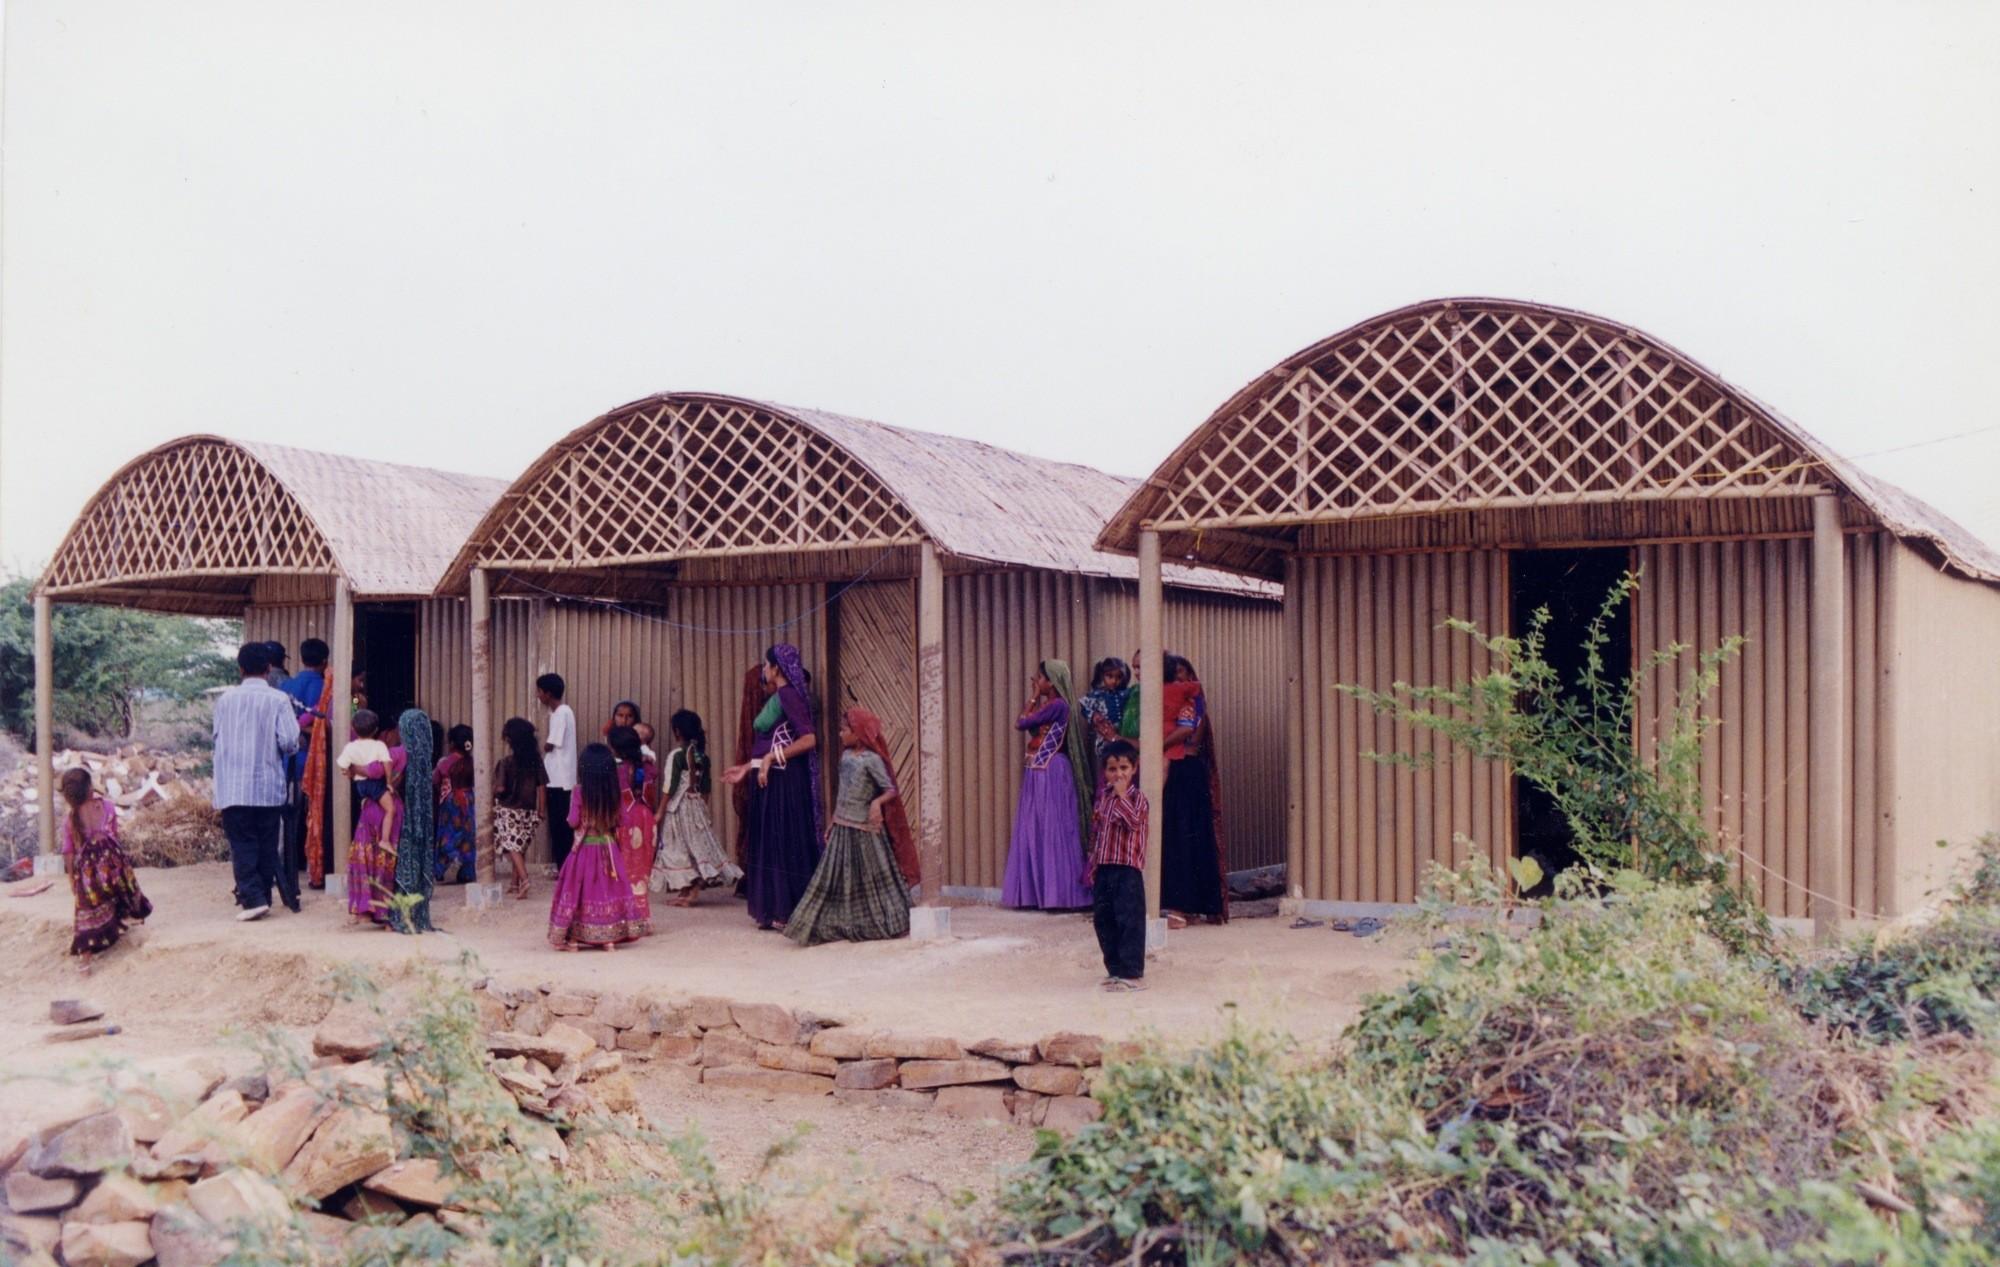 Shigeru Ban lanza campaña para construir refugios de emergencia en Nepal, Vivienda permanente de papel diseñada por Shigeru Ban en India. Image © Kartikeya Shodhan